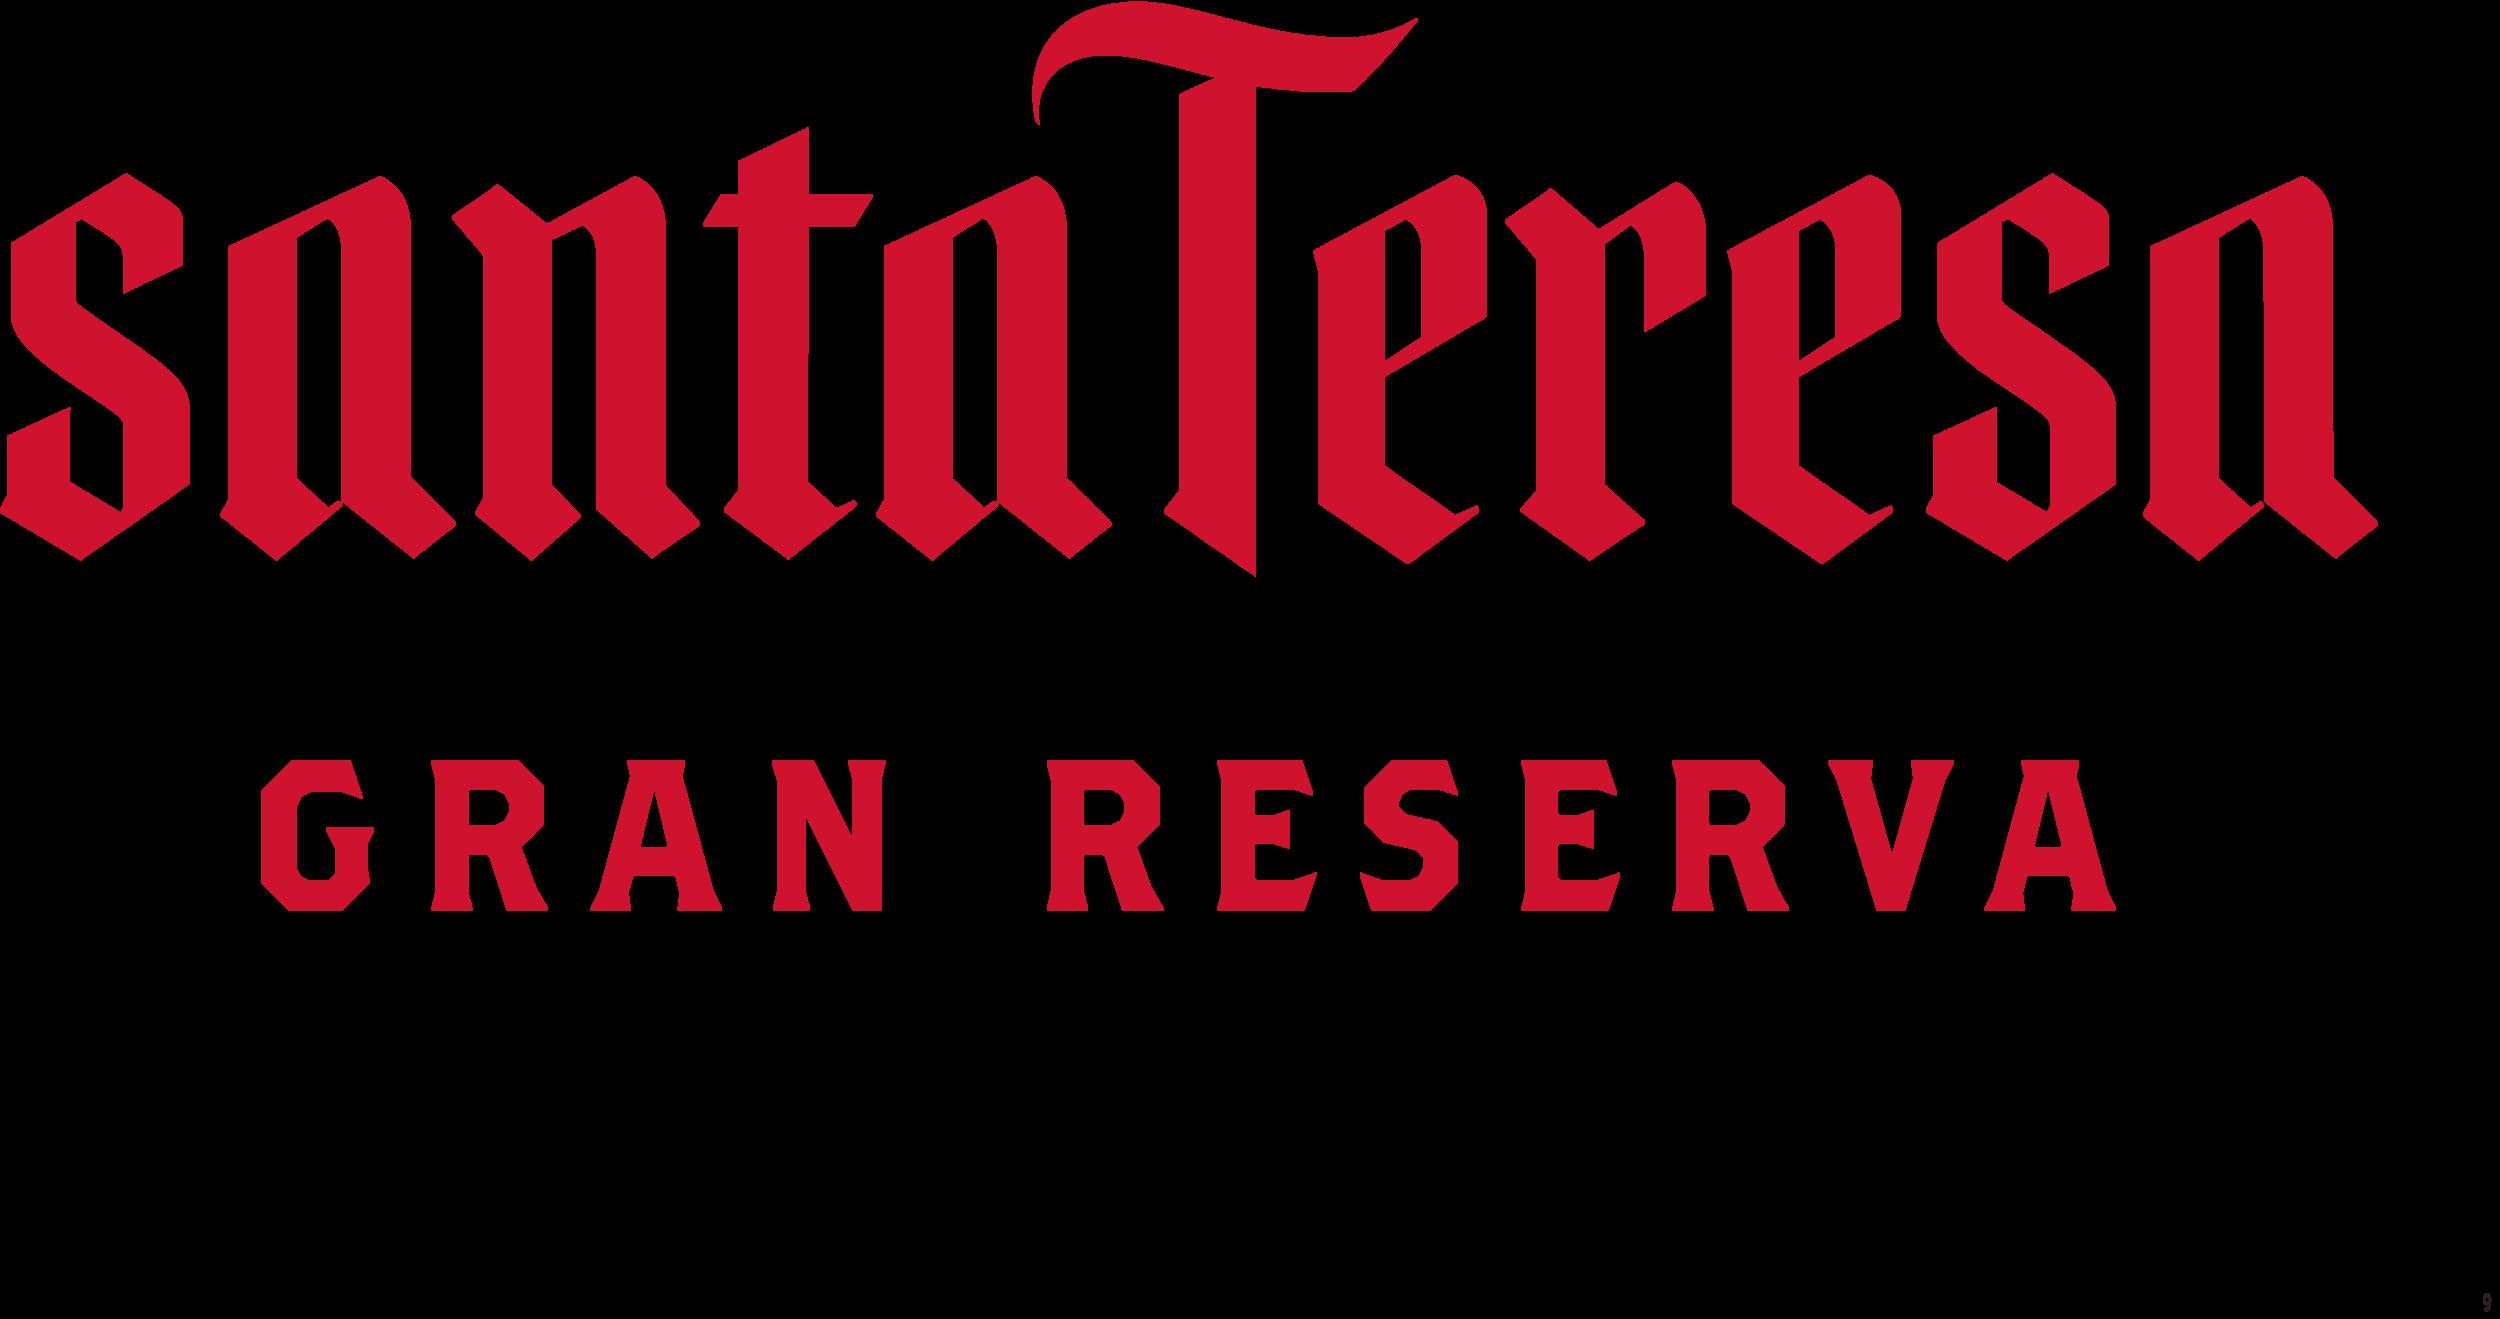 STA TERESA logos 2019-1.png